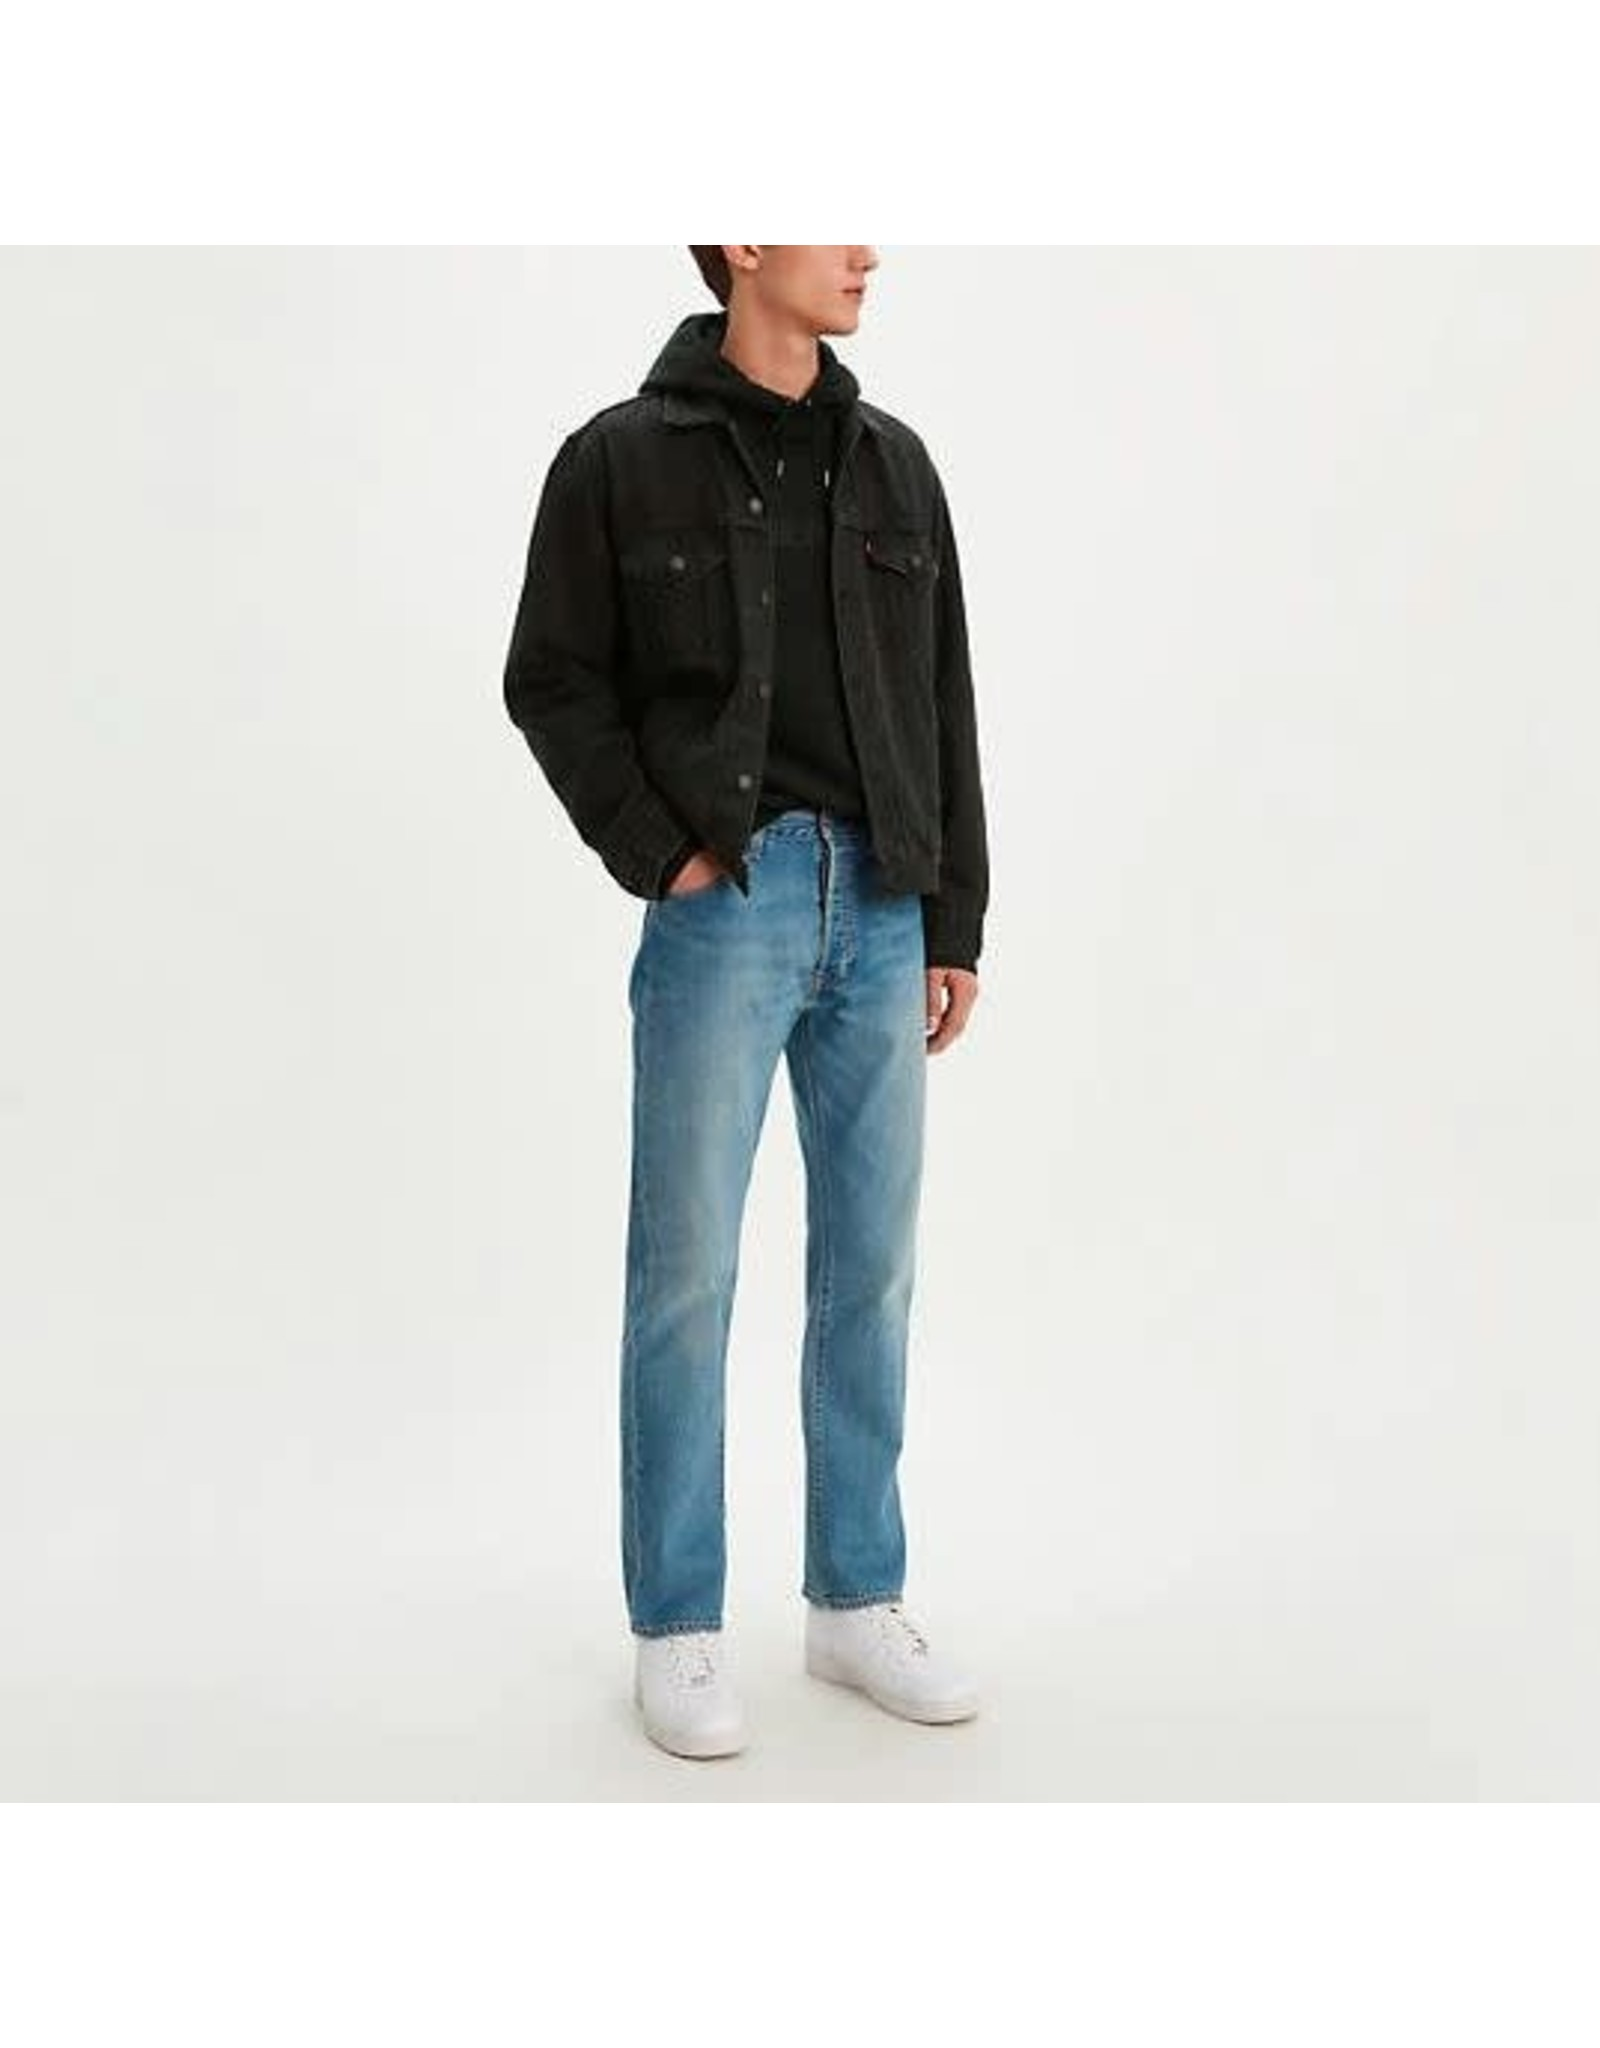 Levi's - jeans 501  '93 straight leg